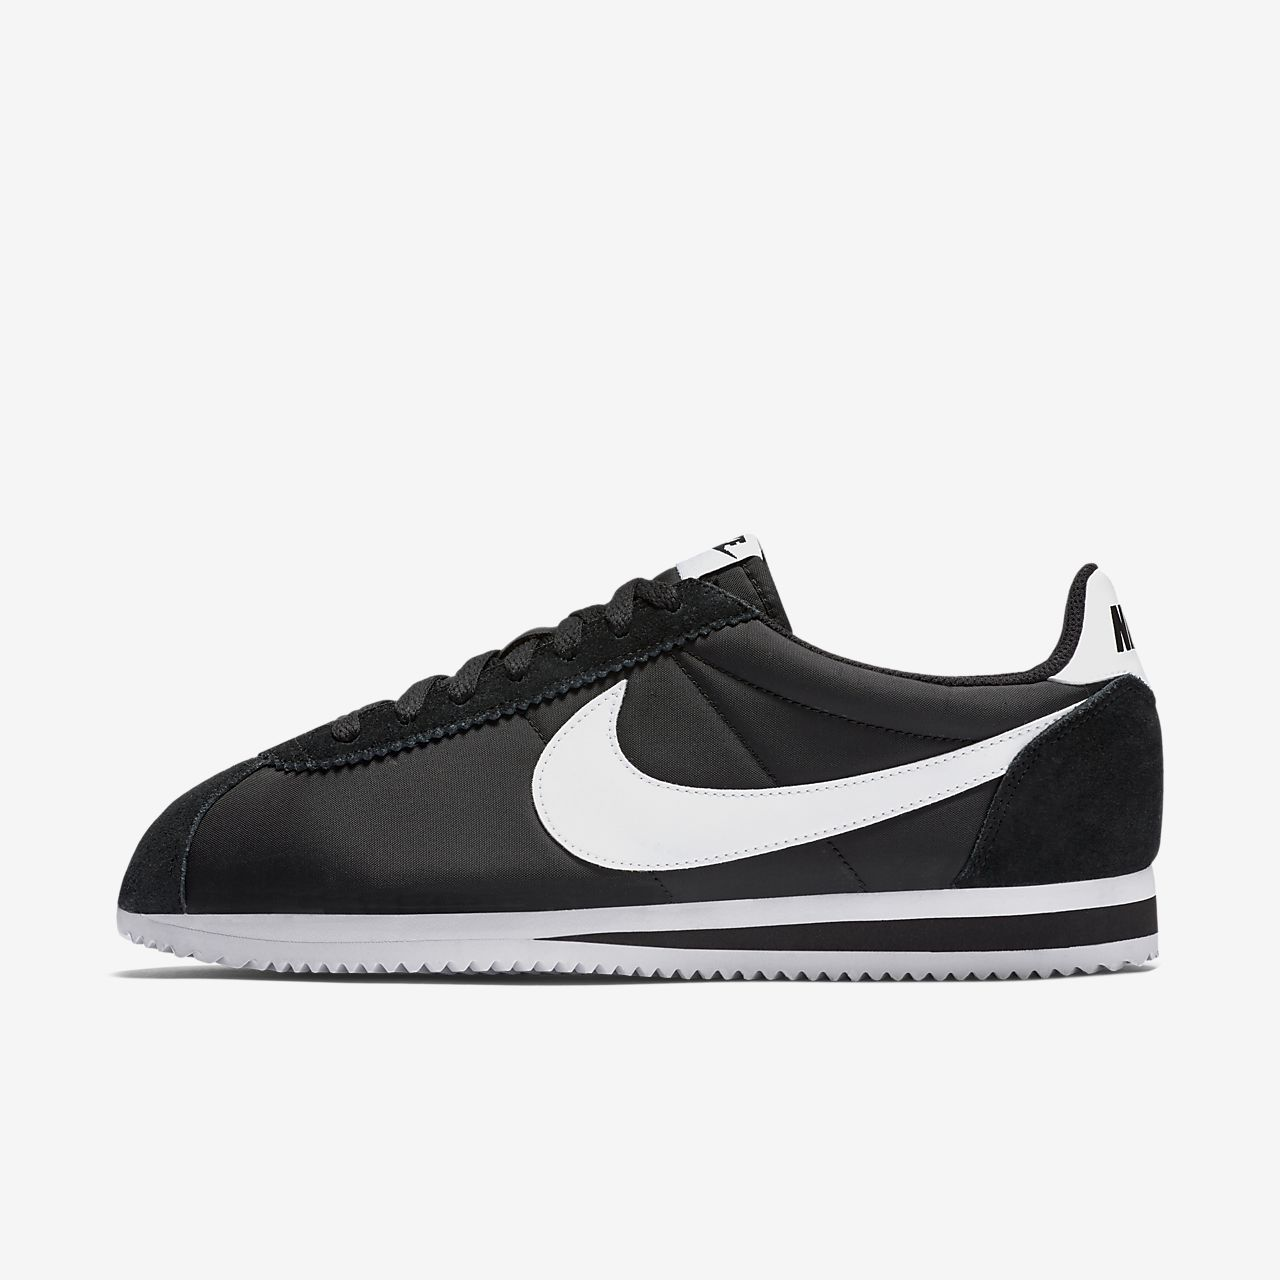 new concept e1091 6f614 ... Buty uniseks Nike Classic Cortez Nylon